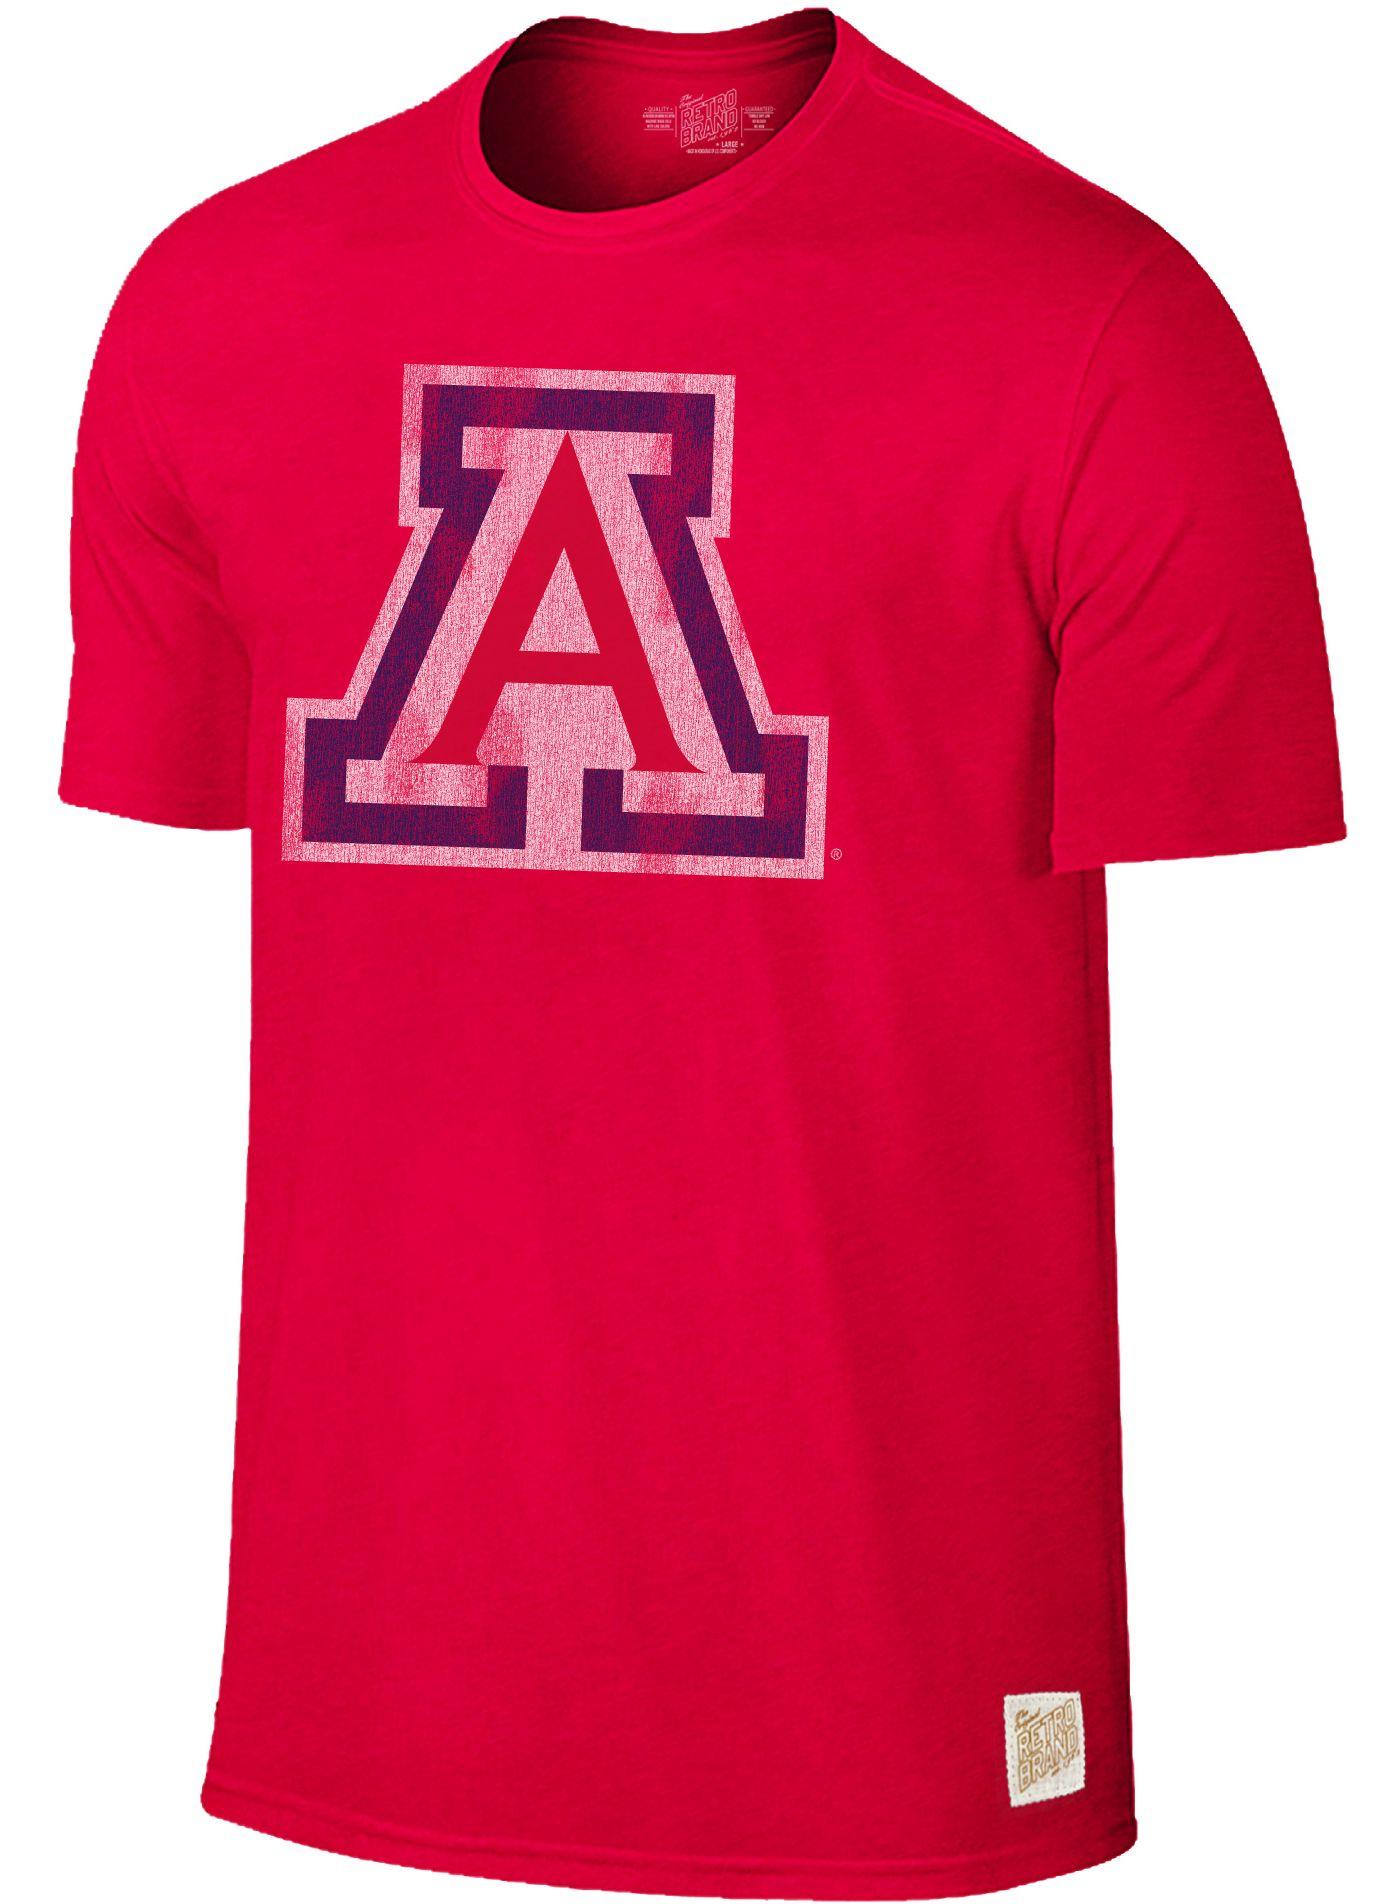 Original Retro Brand Men's Arizona Wildcats Cardinal Dual Blend T-Shirt